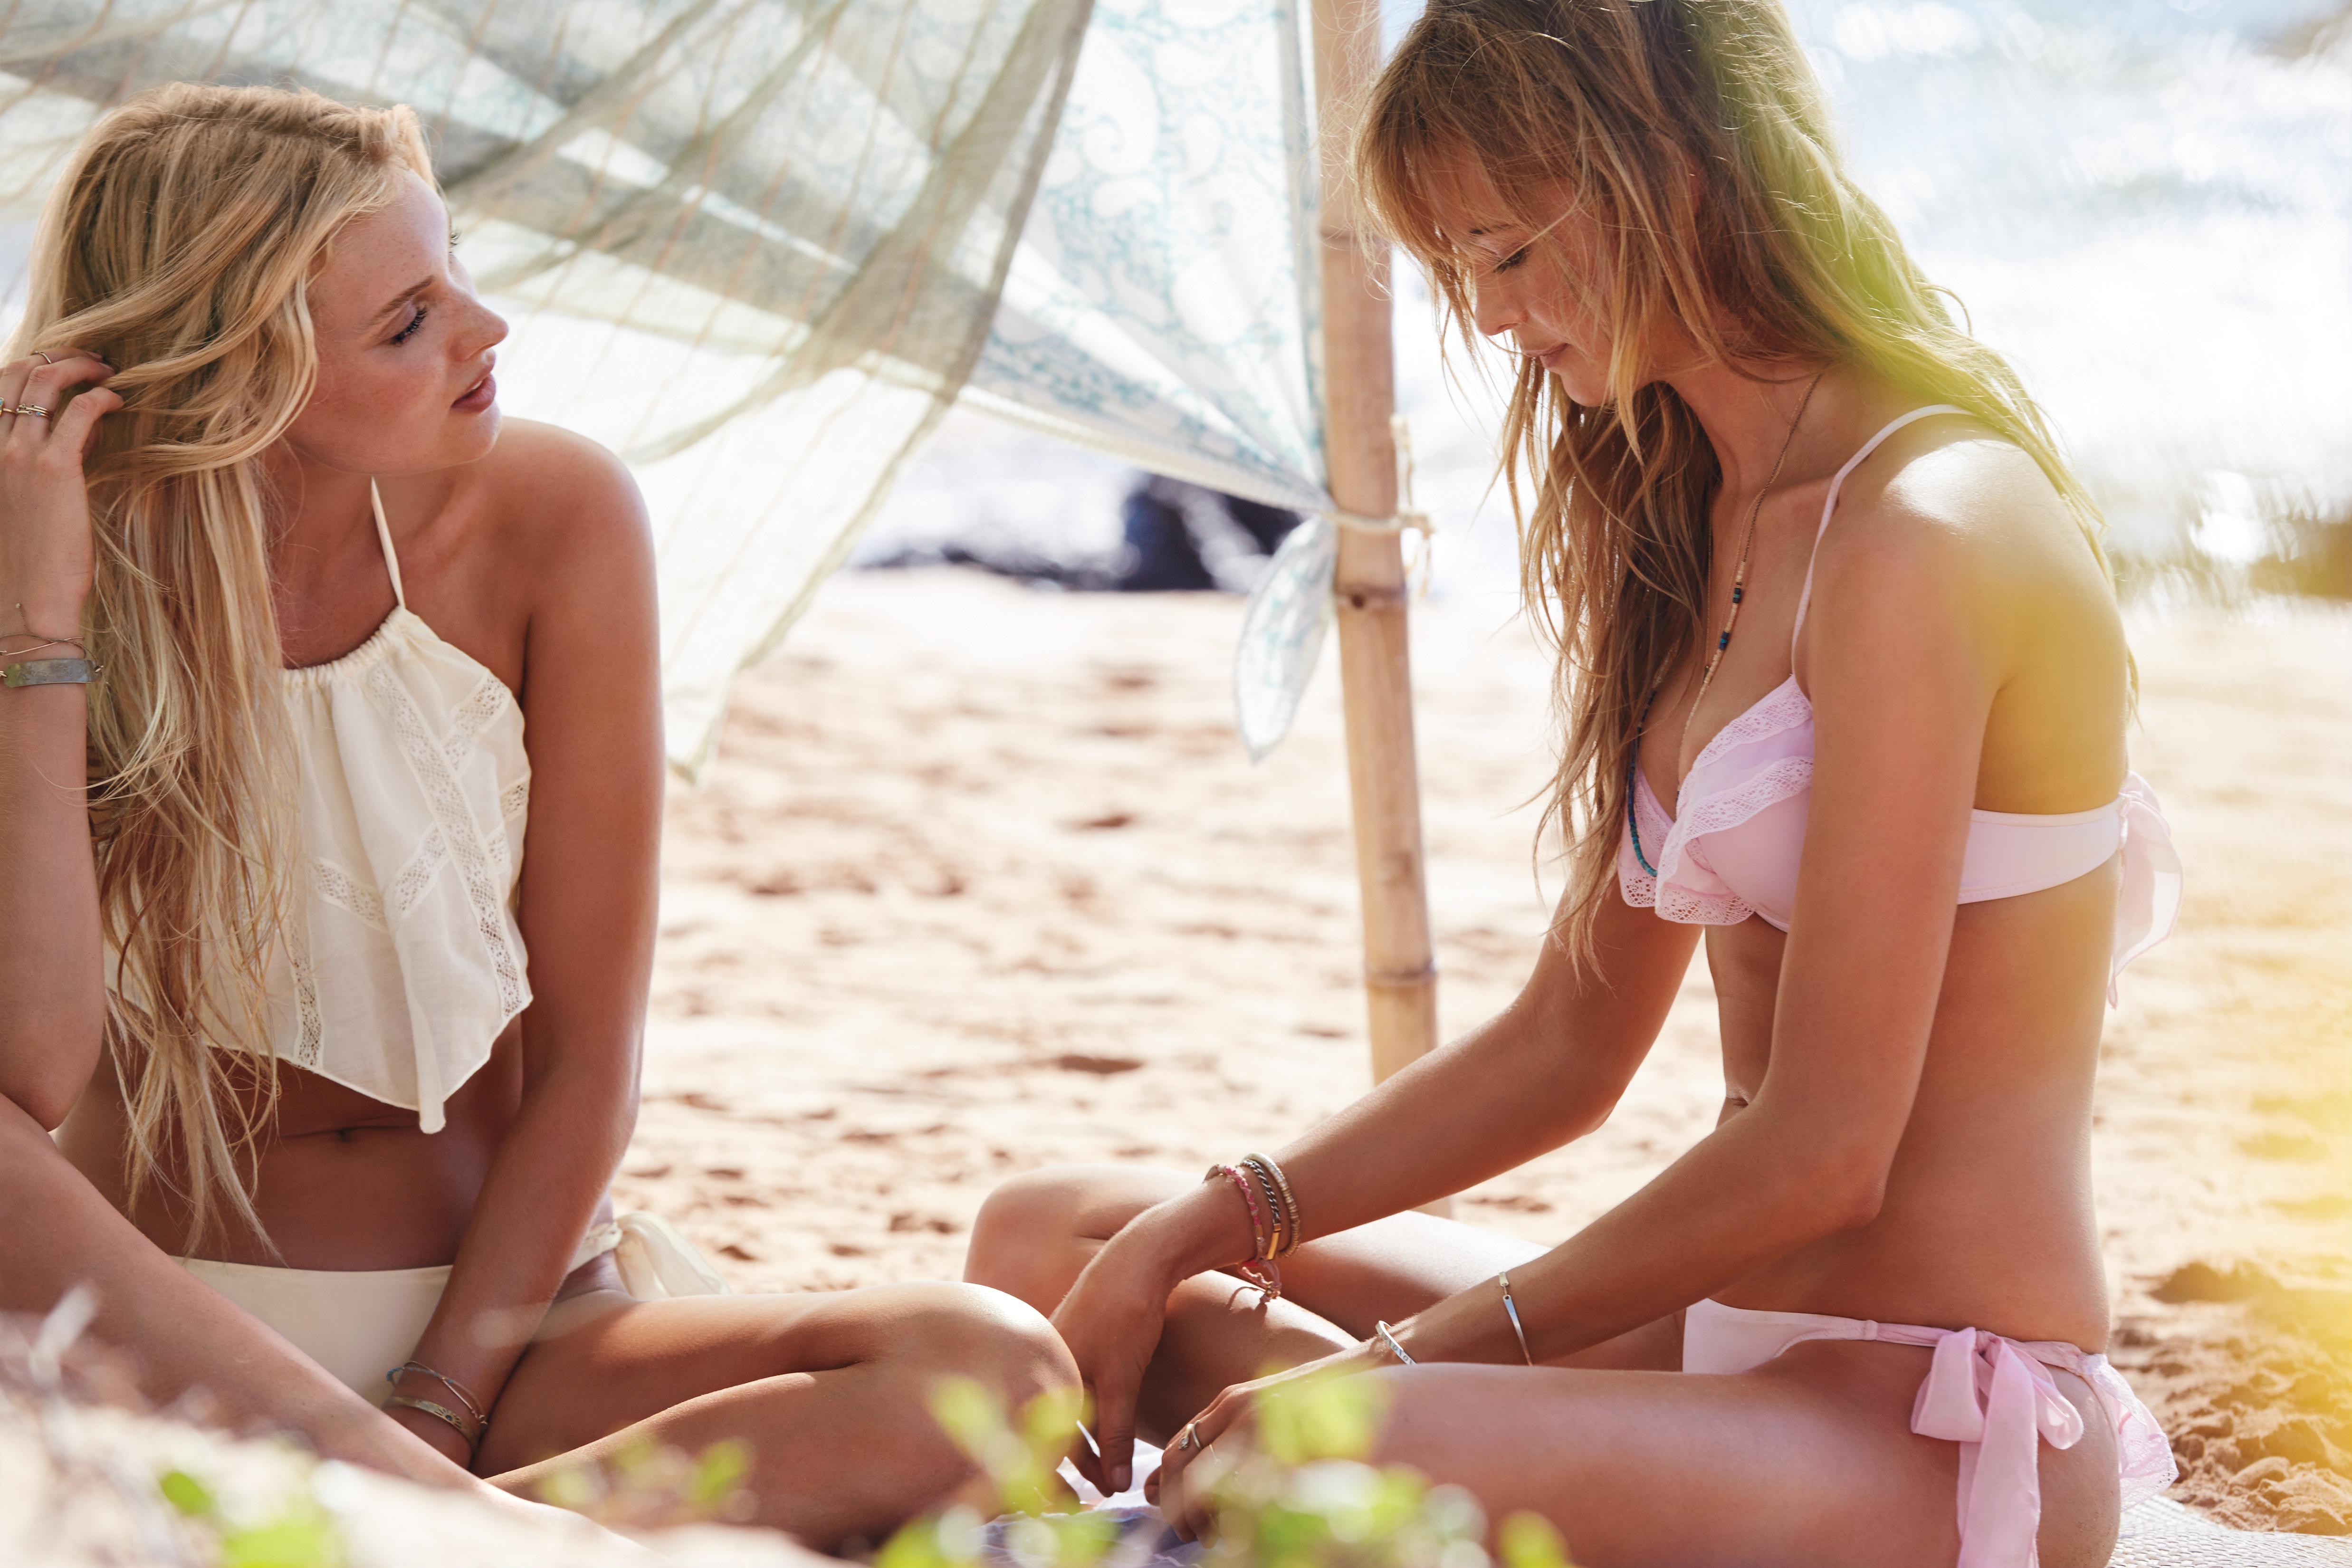 Beautiful Victoria's Secret Supermodels Modeling For Victoria's Secret Swim.